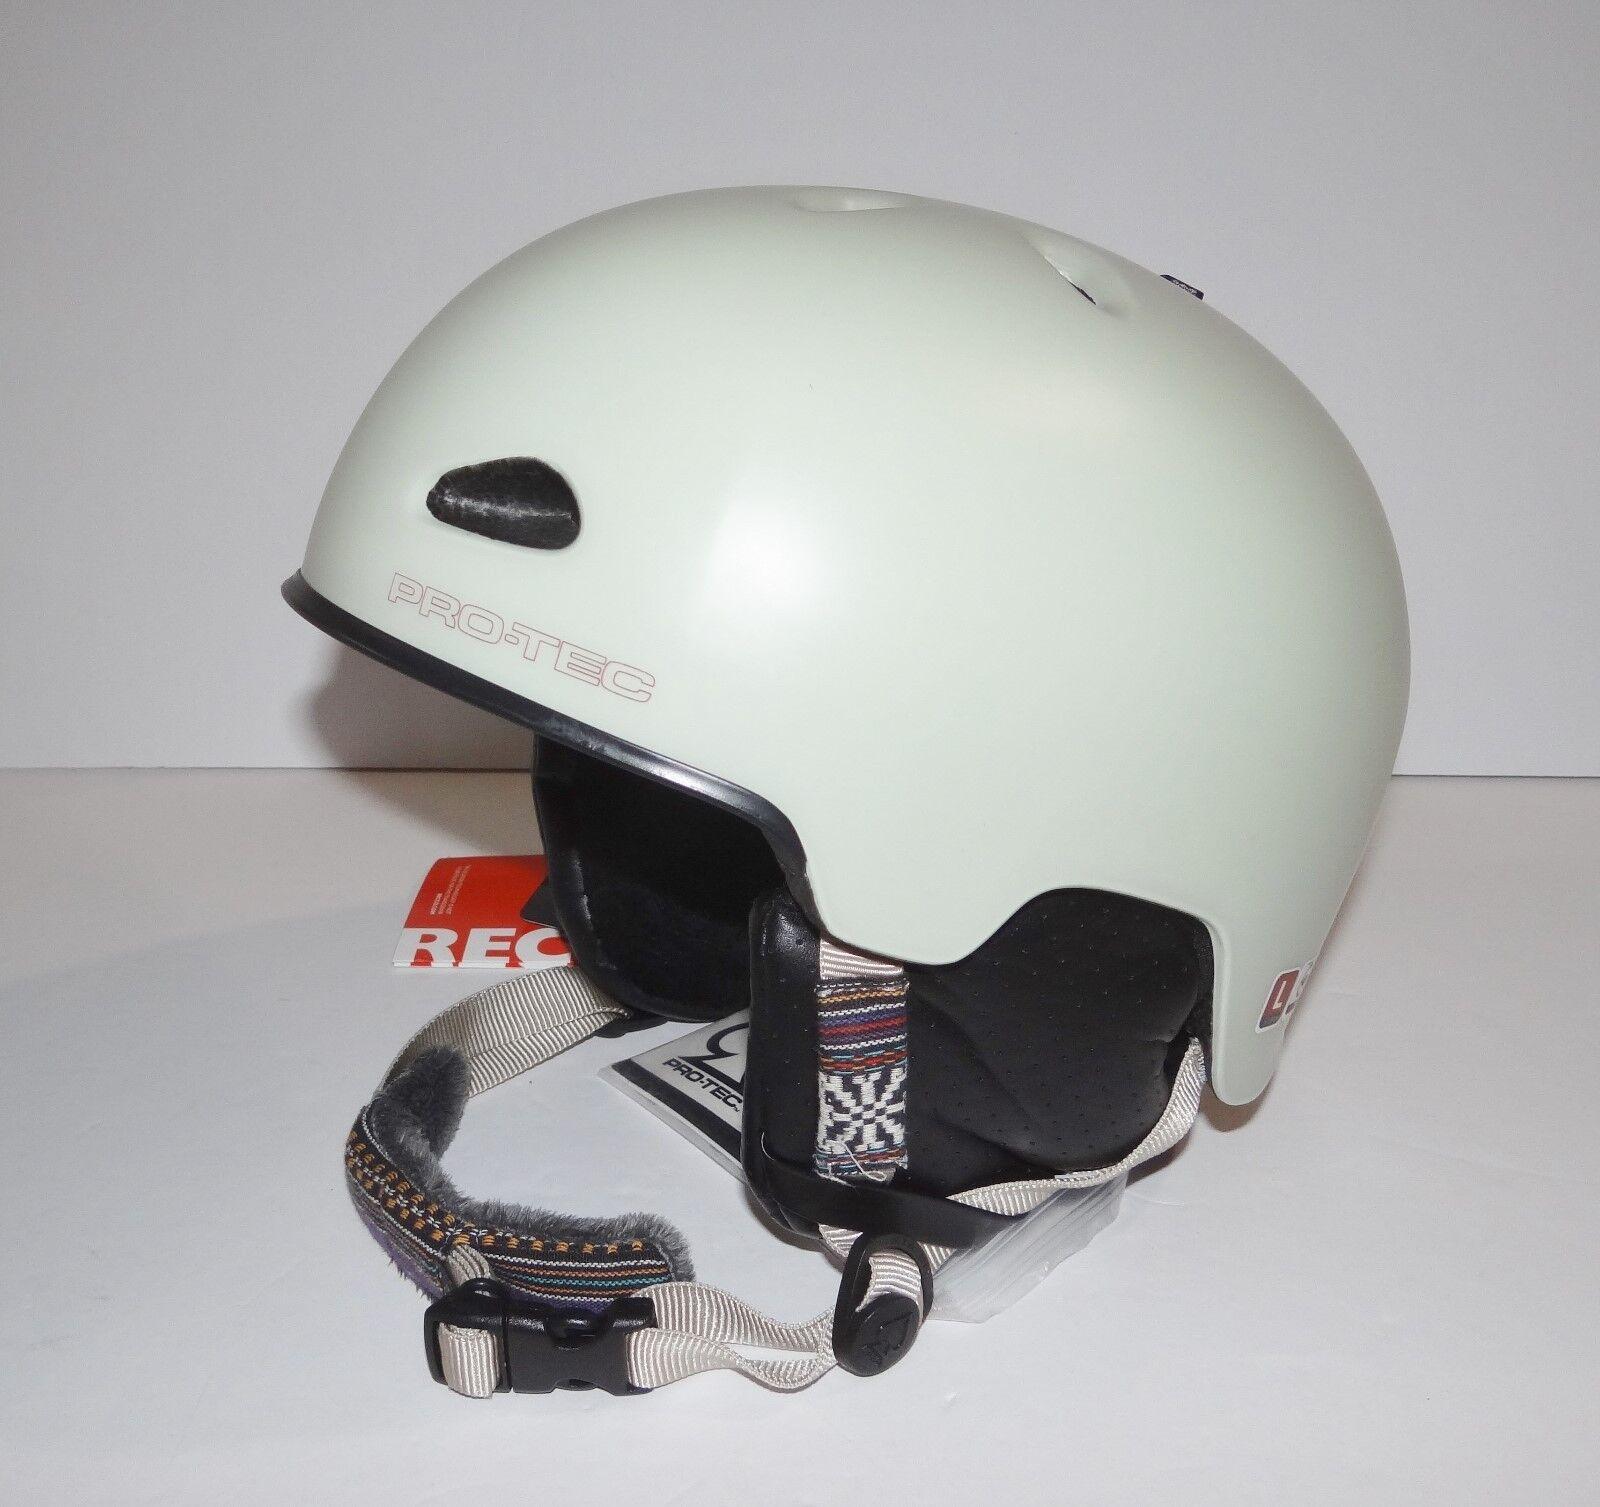 New Pro-Tec daSie Kensington BOA RECCO Ski Snowboard Helmet Large 57cm-58cm